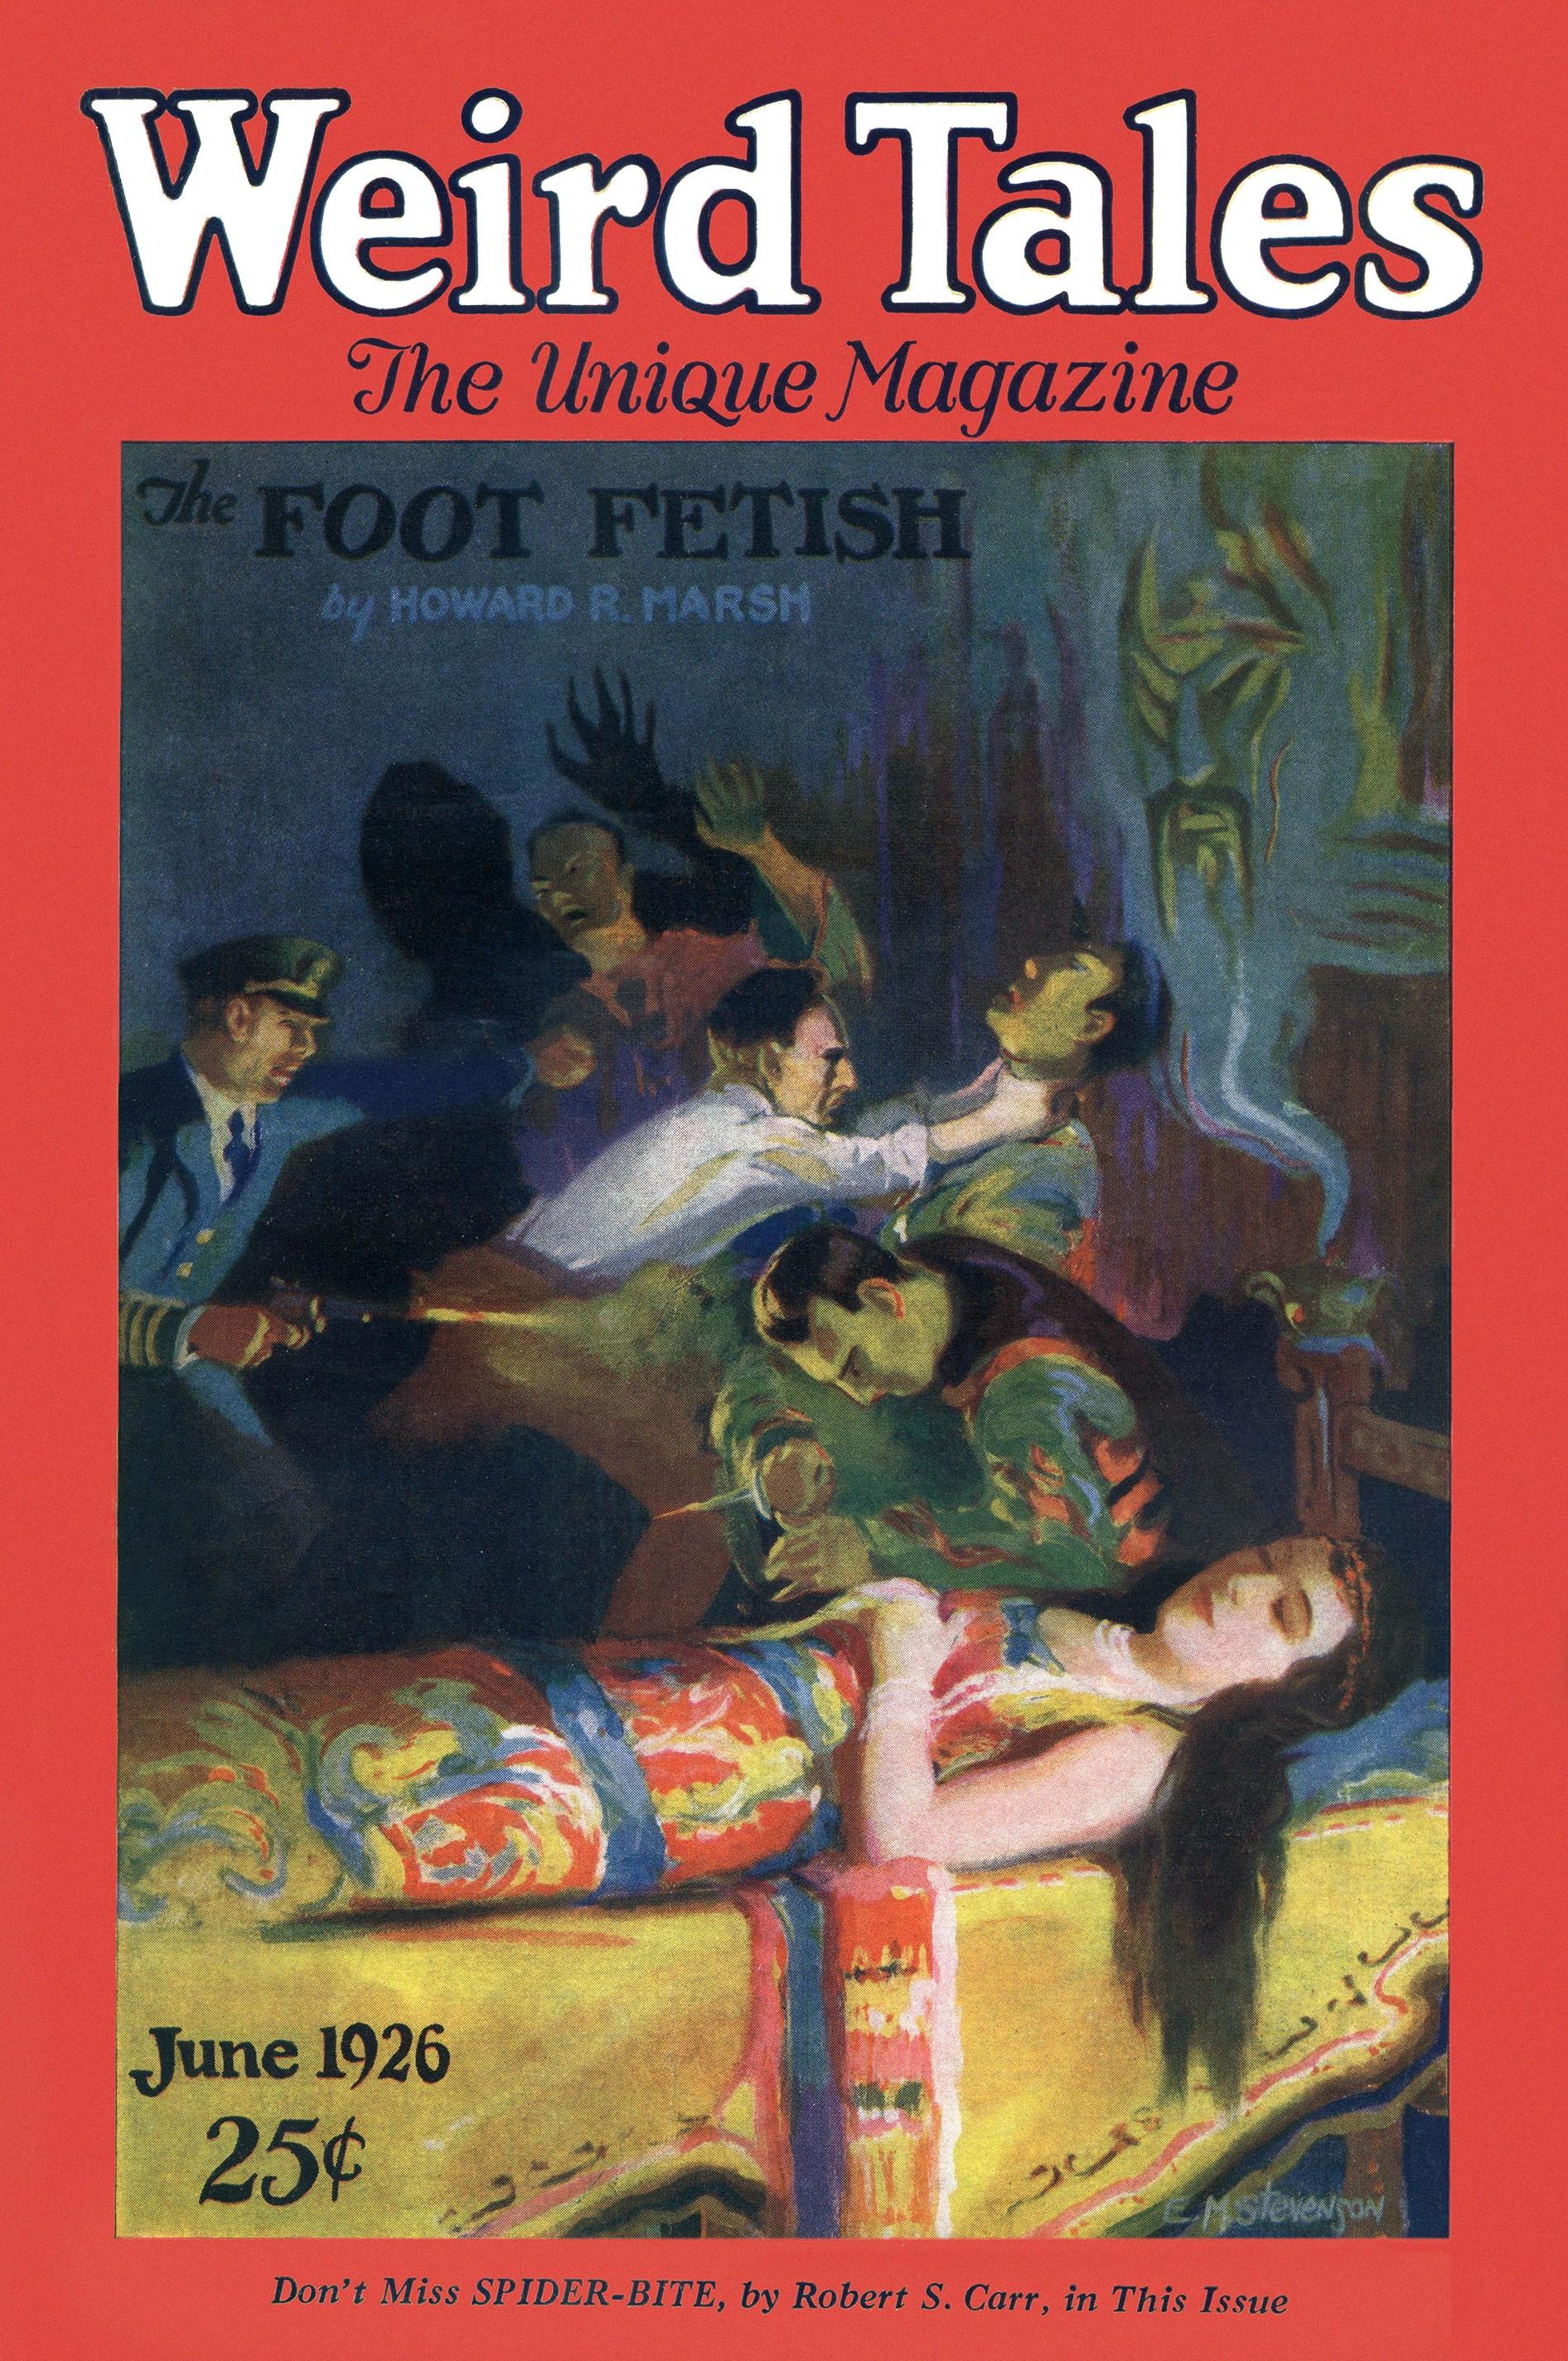 Foot fetish fiction